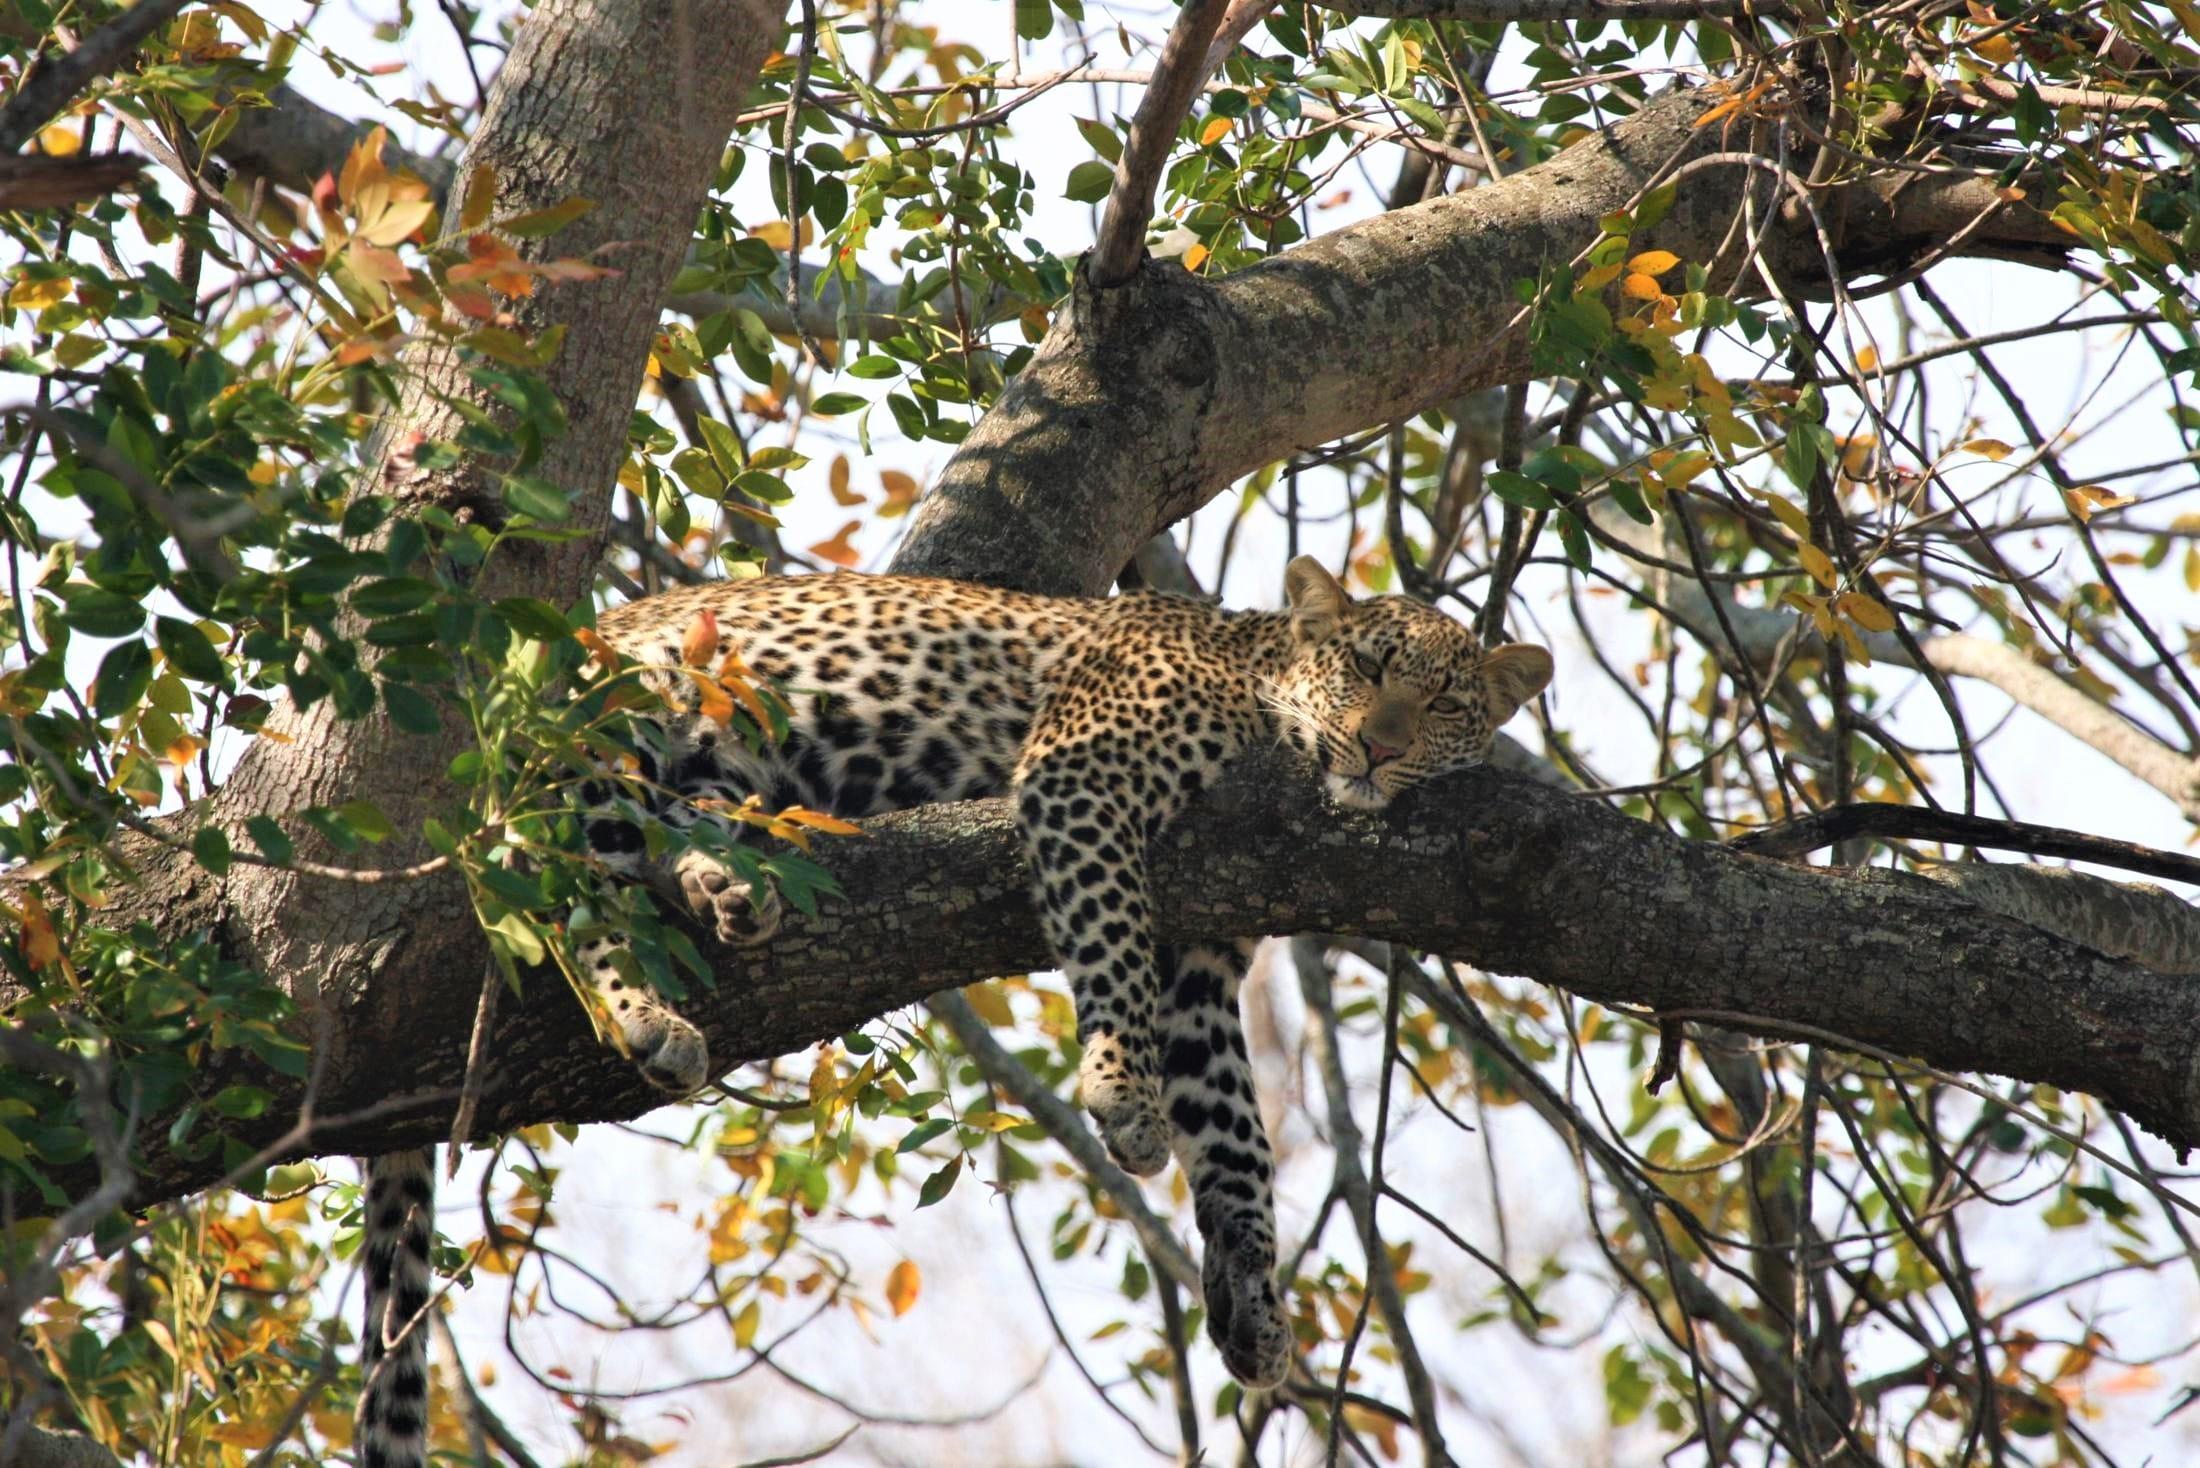 Safari & Natuur reizen in Afrika - Luipaard in boom in Kruger National Park